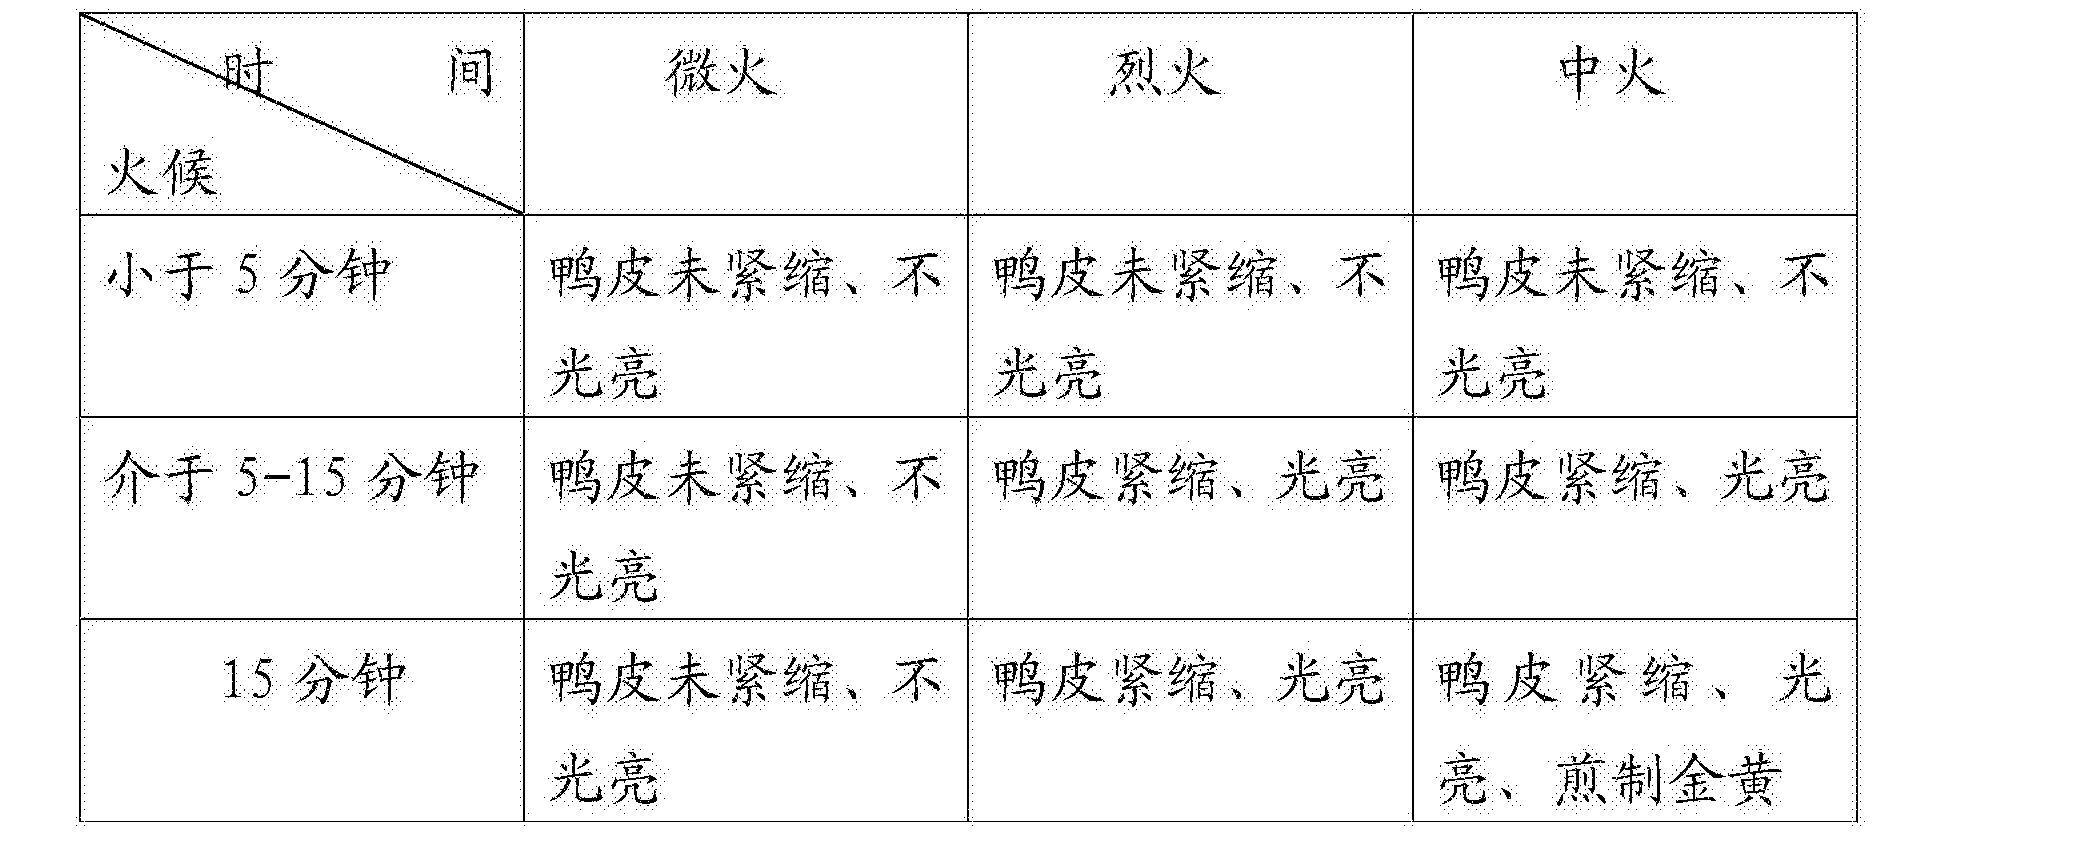 Figure CN106490610AD00051